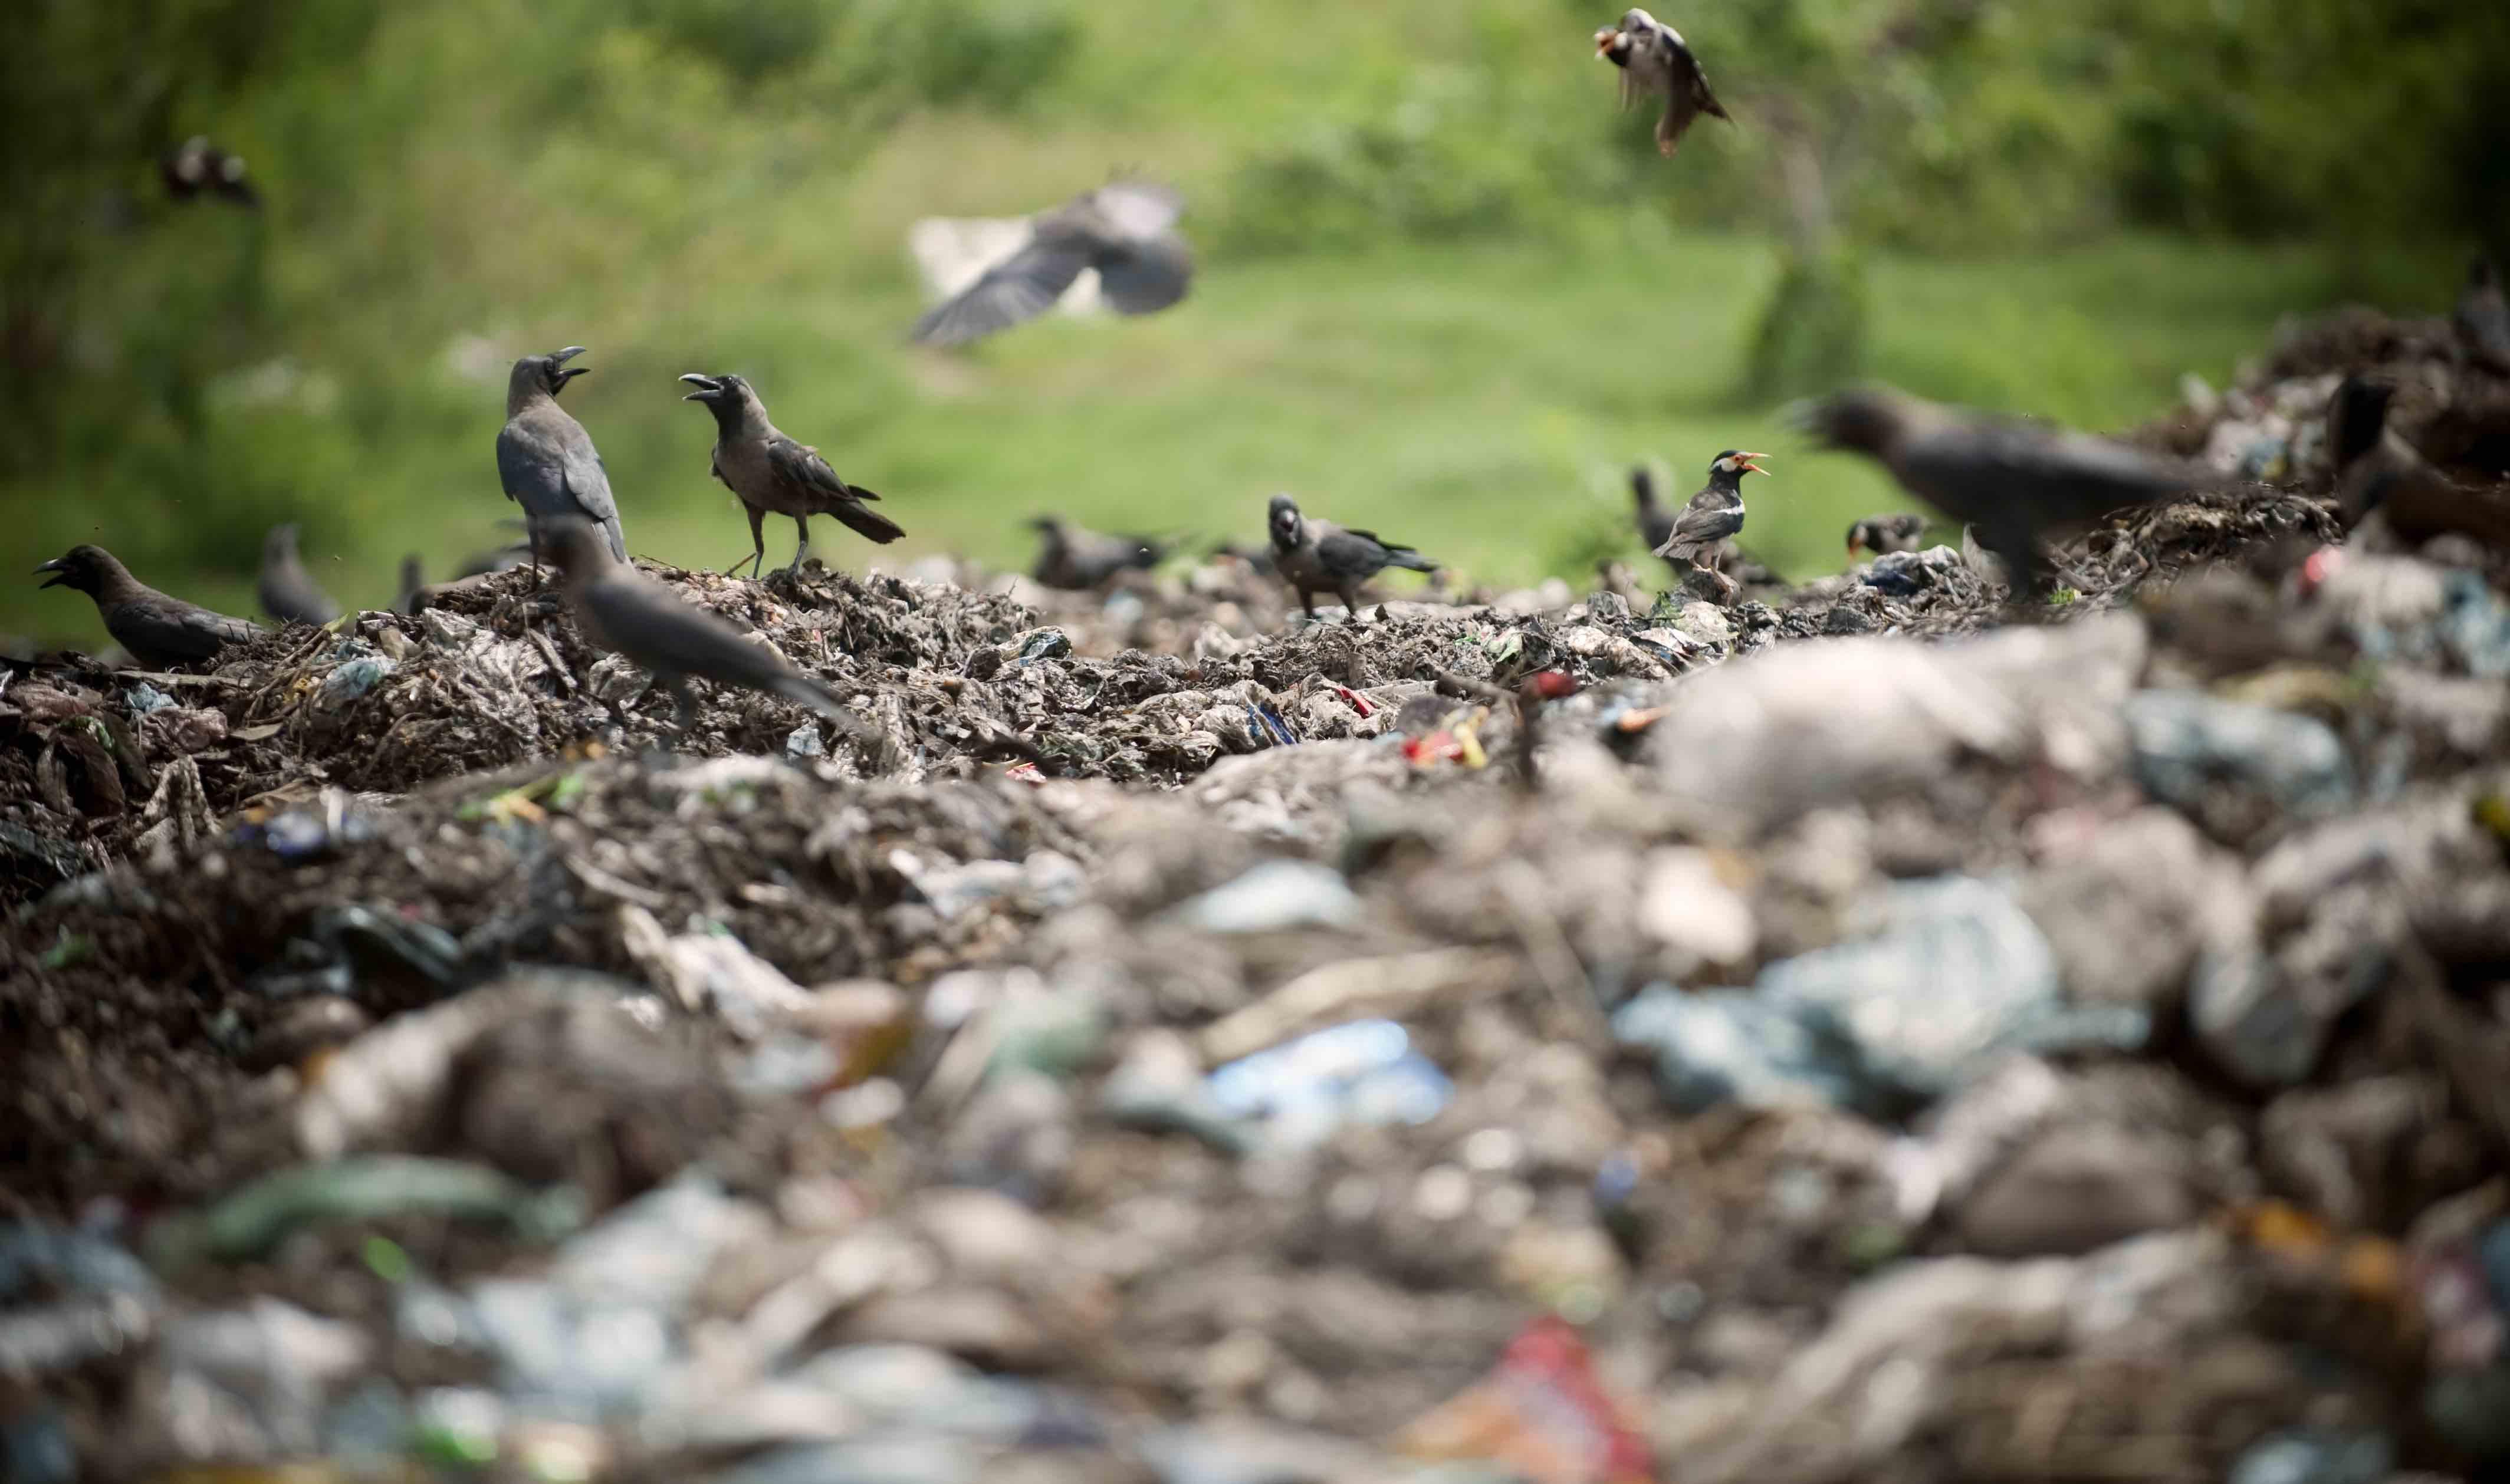 Scavenger birds pick a dump site in Dhaka (Photo: UN Photo)